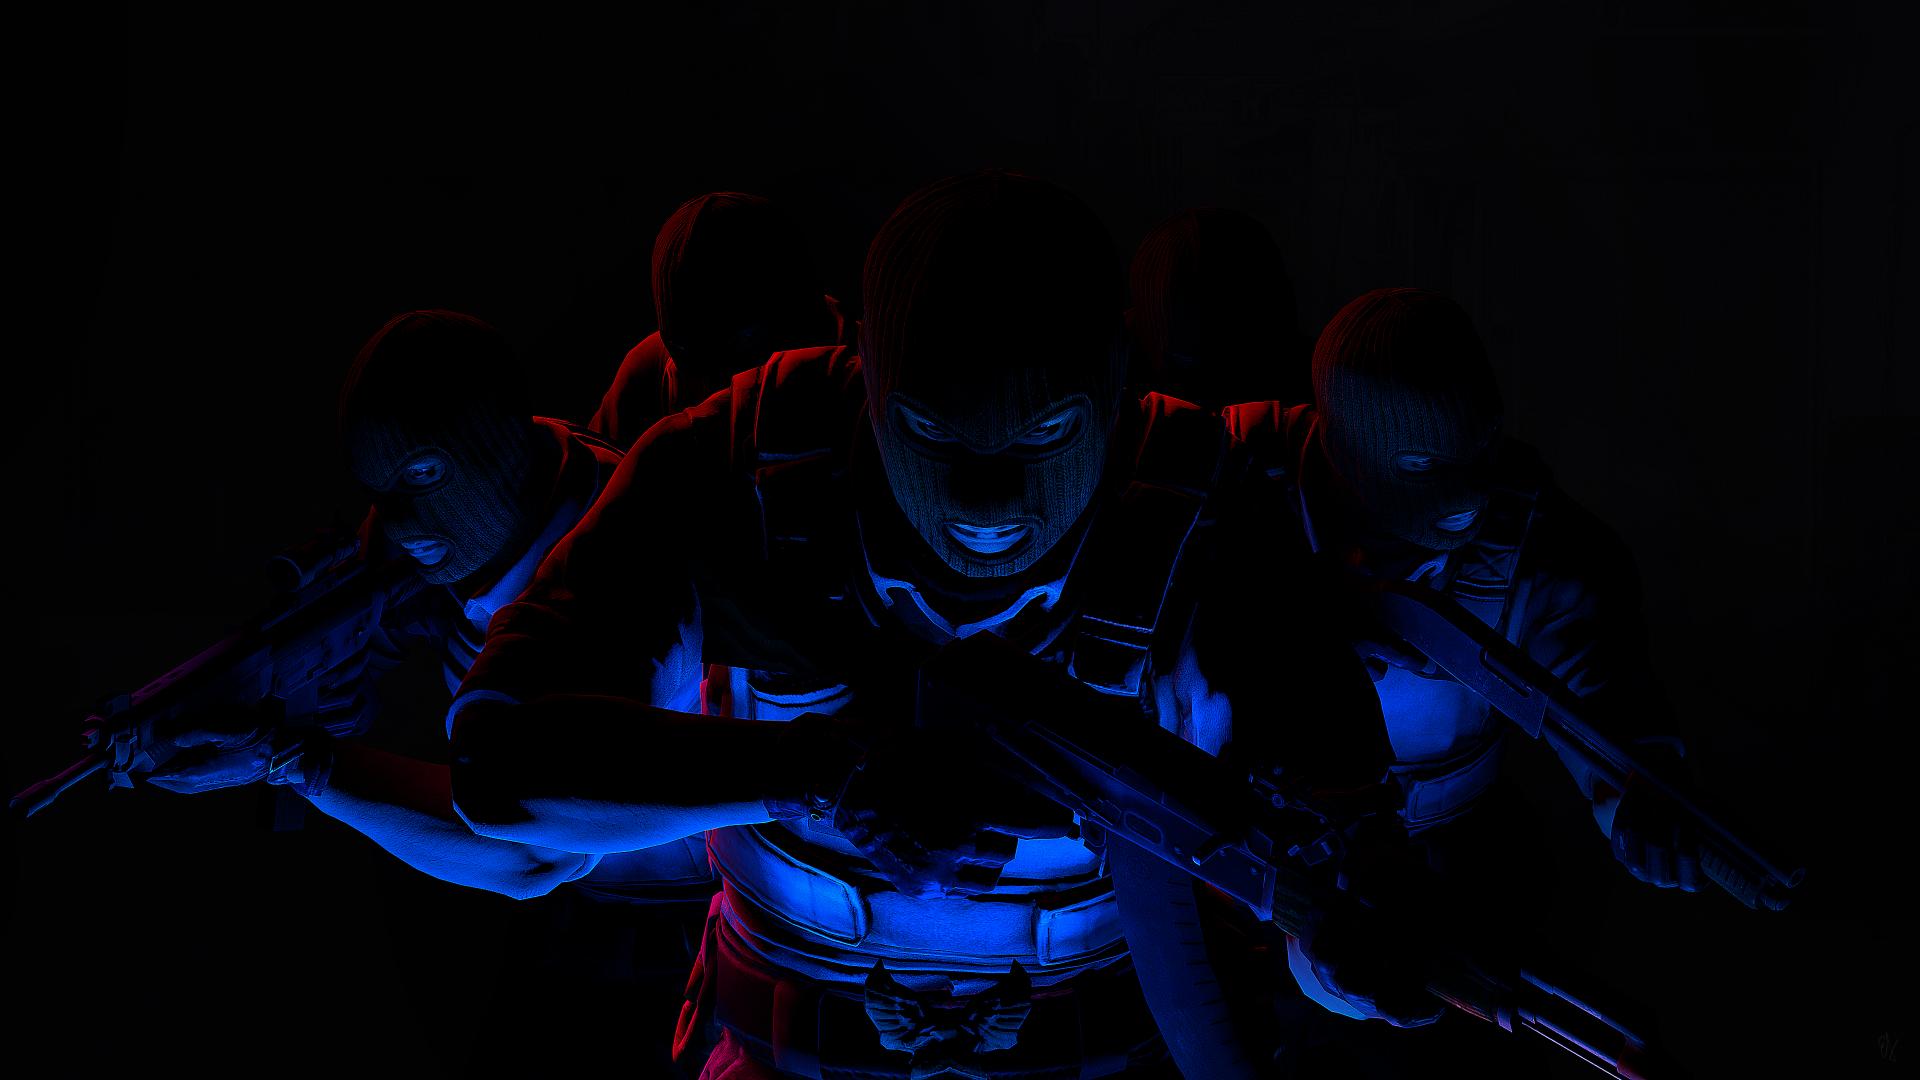 Cs Go 4k Wallpaper Counter Strike Global Offensive Phoenix Team Phoenix Connection Black Dark 2243